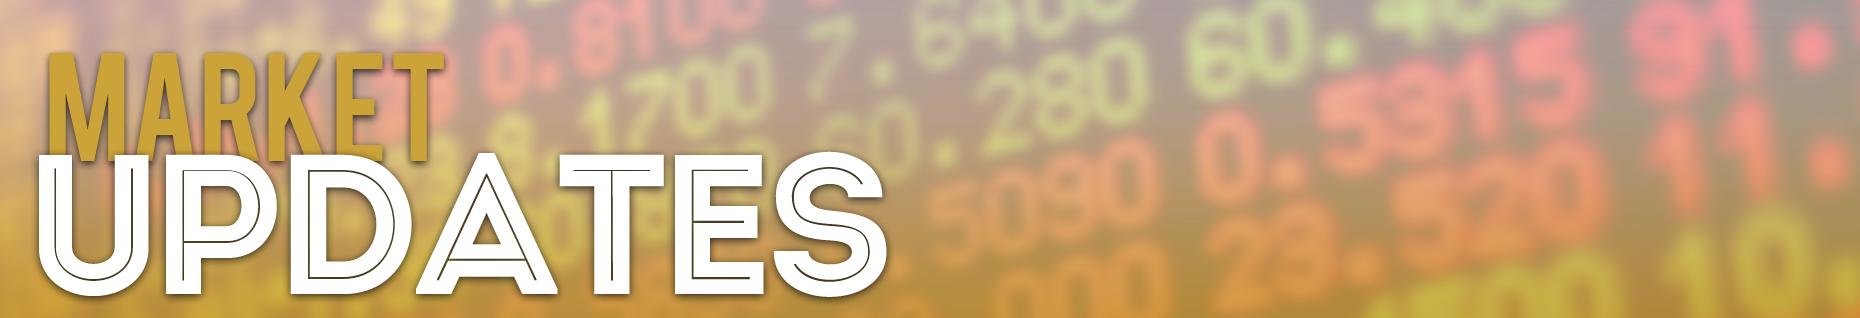 category_headers/market-updates.jpg